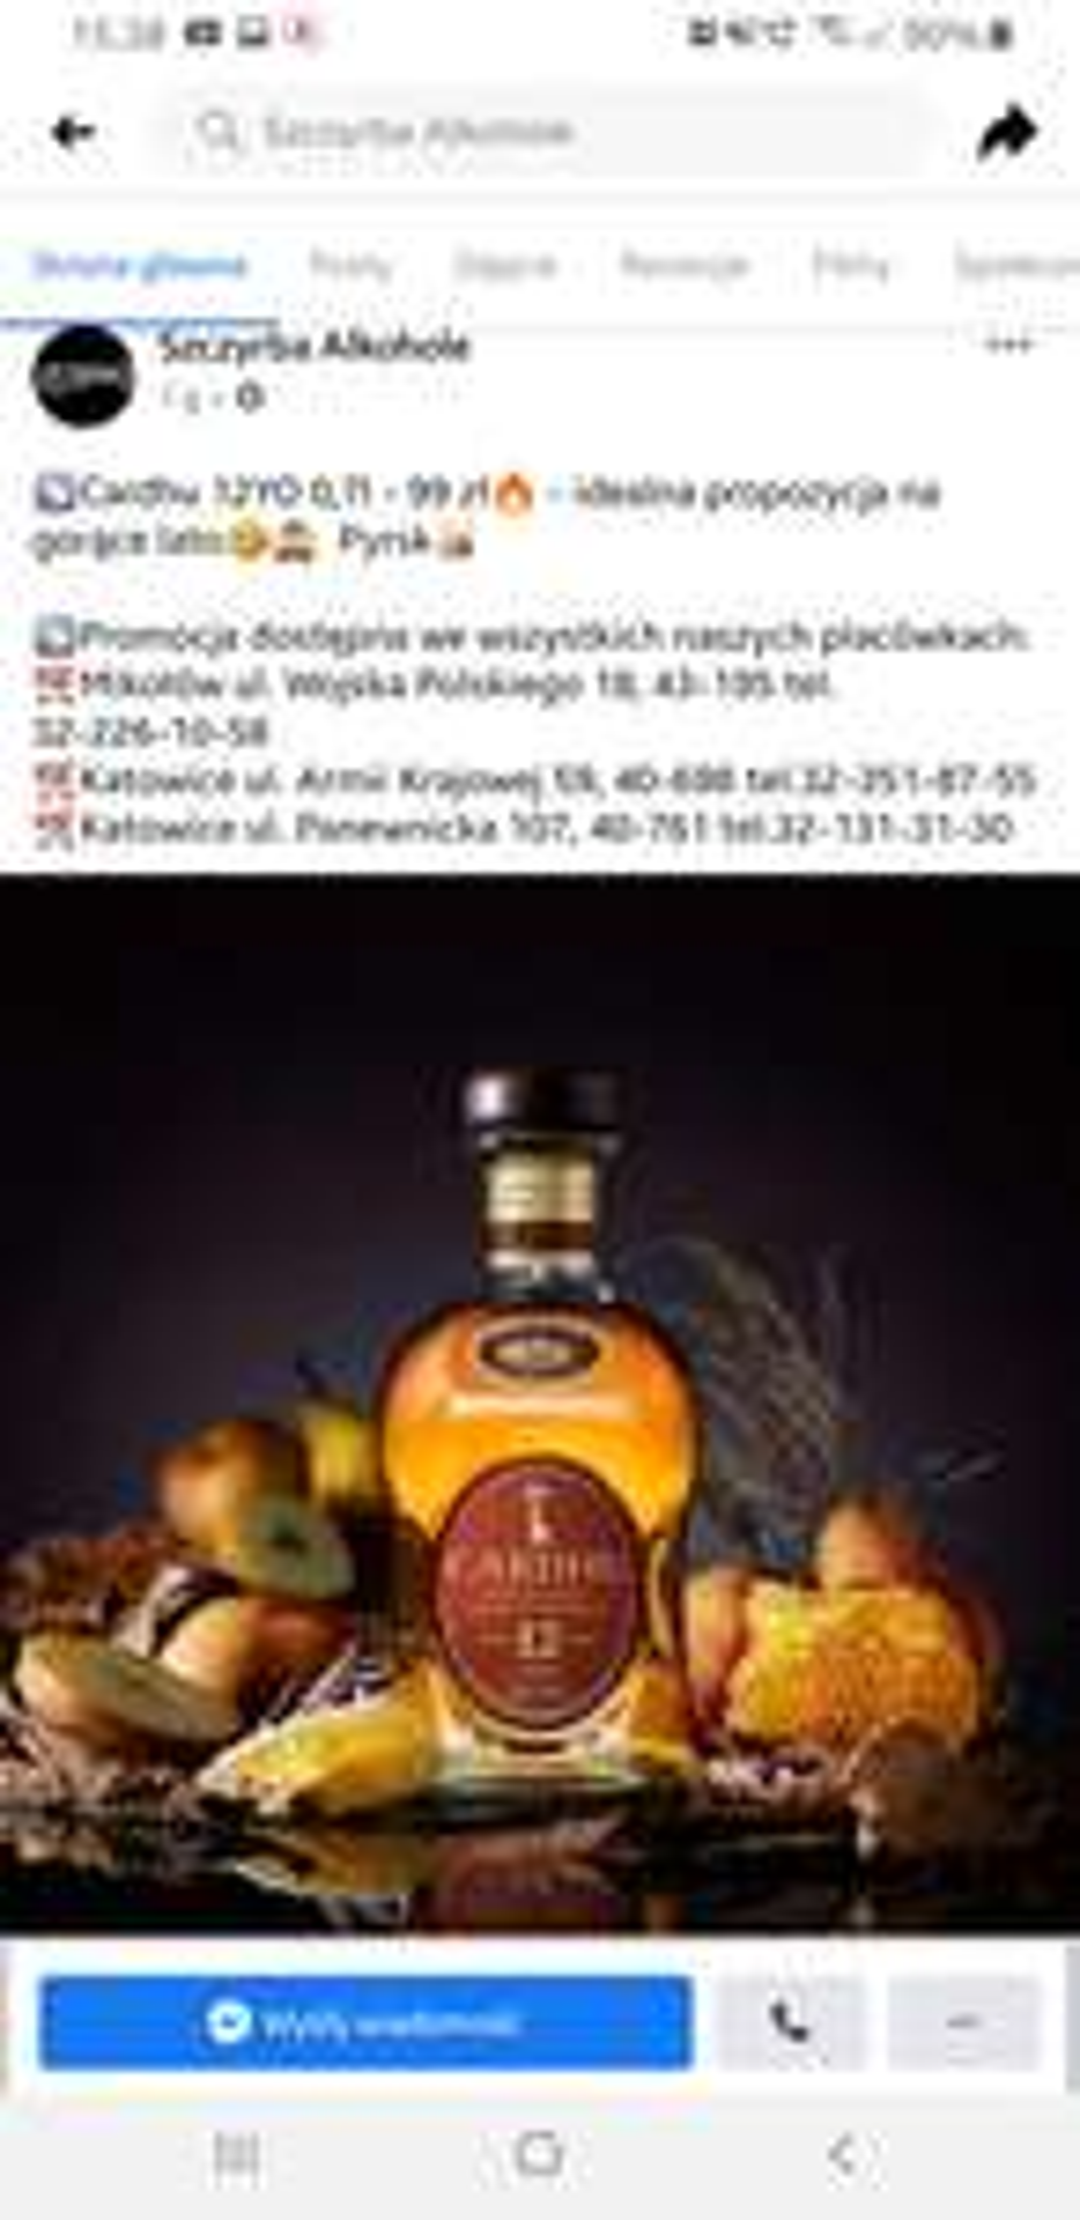 Whisky Single Malt Cardhu 12YO 0,7 Szczyrba Alkohole Slask